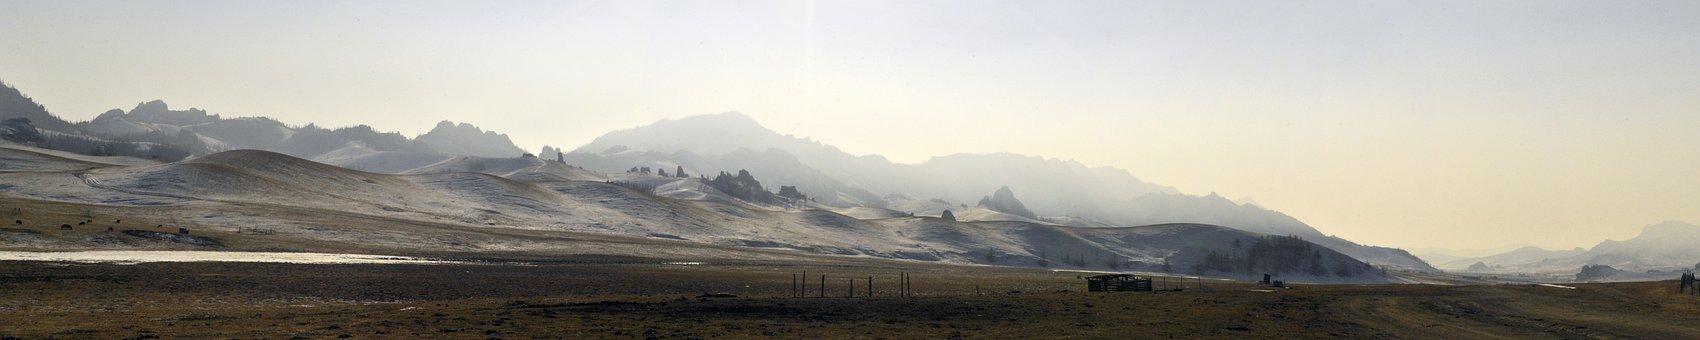 Mountains, Winter, Landscape, Nature, Cold, Mongolia